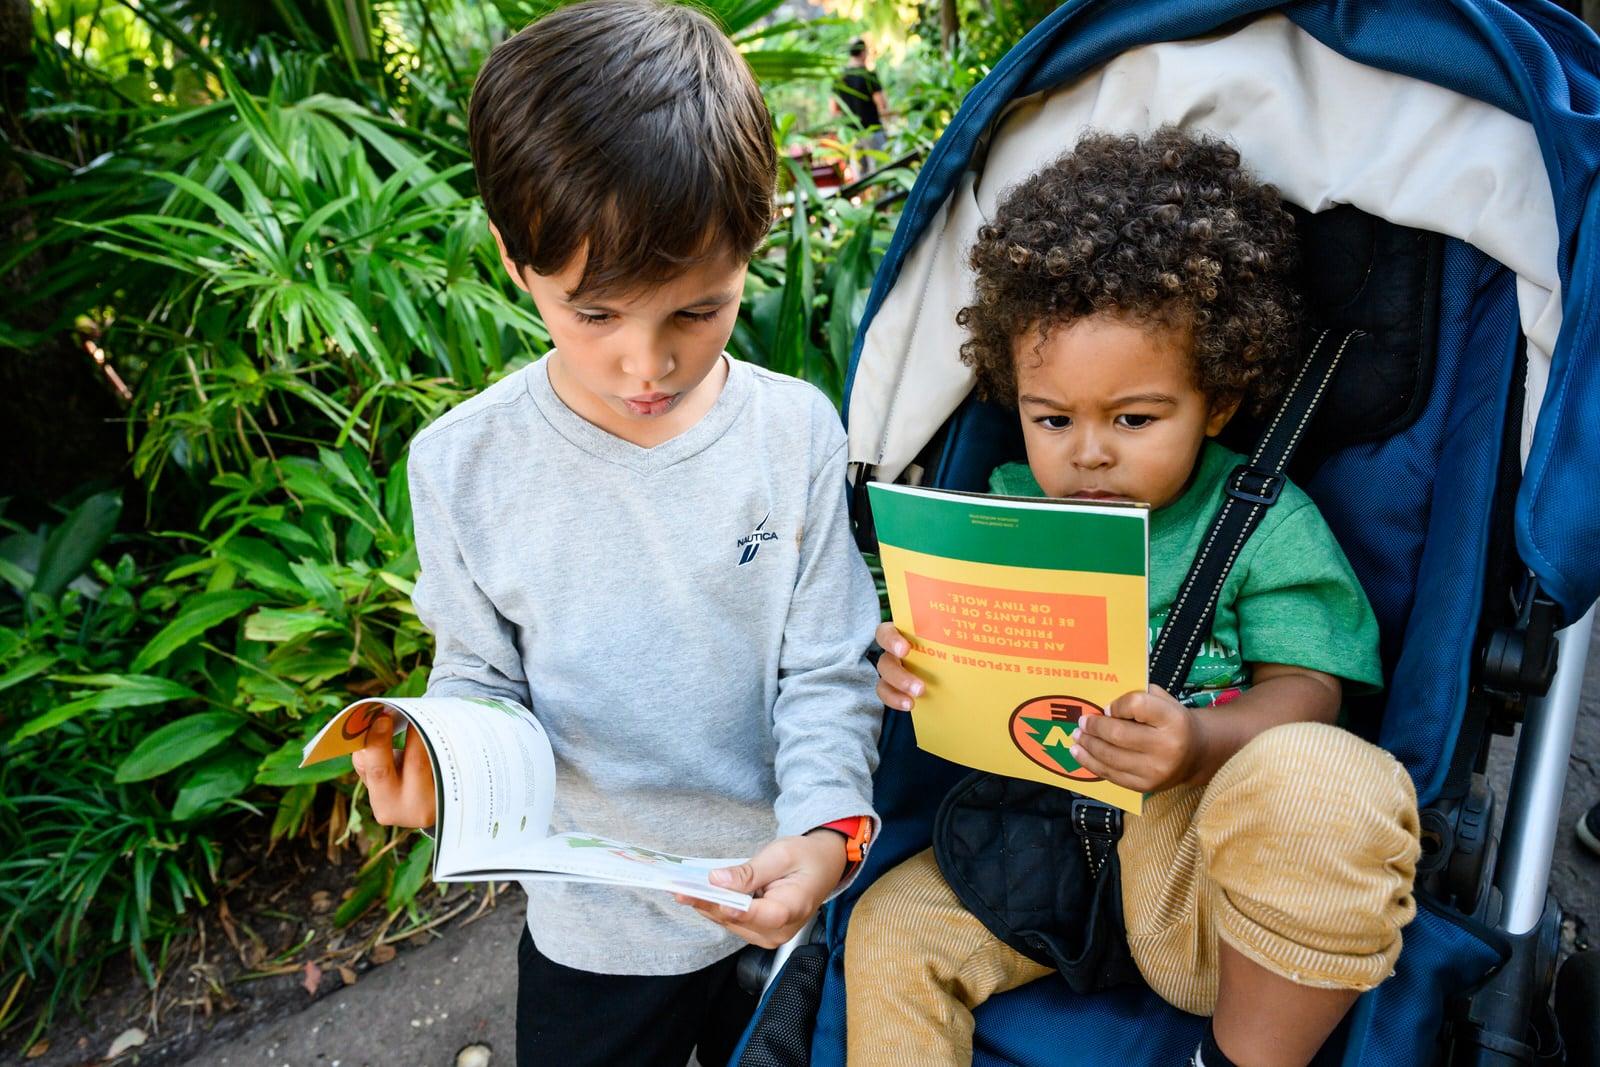 boys look at Wilderness Books at Animal Kingdom